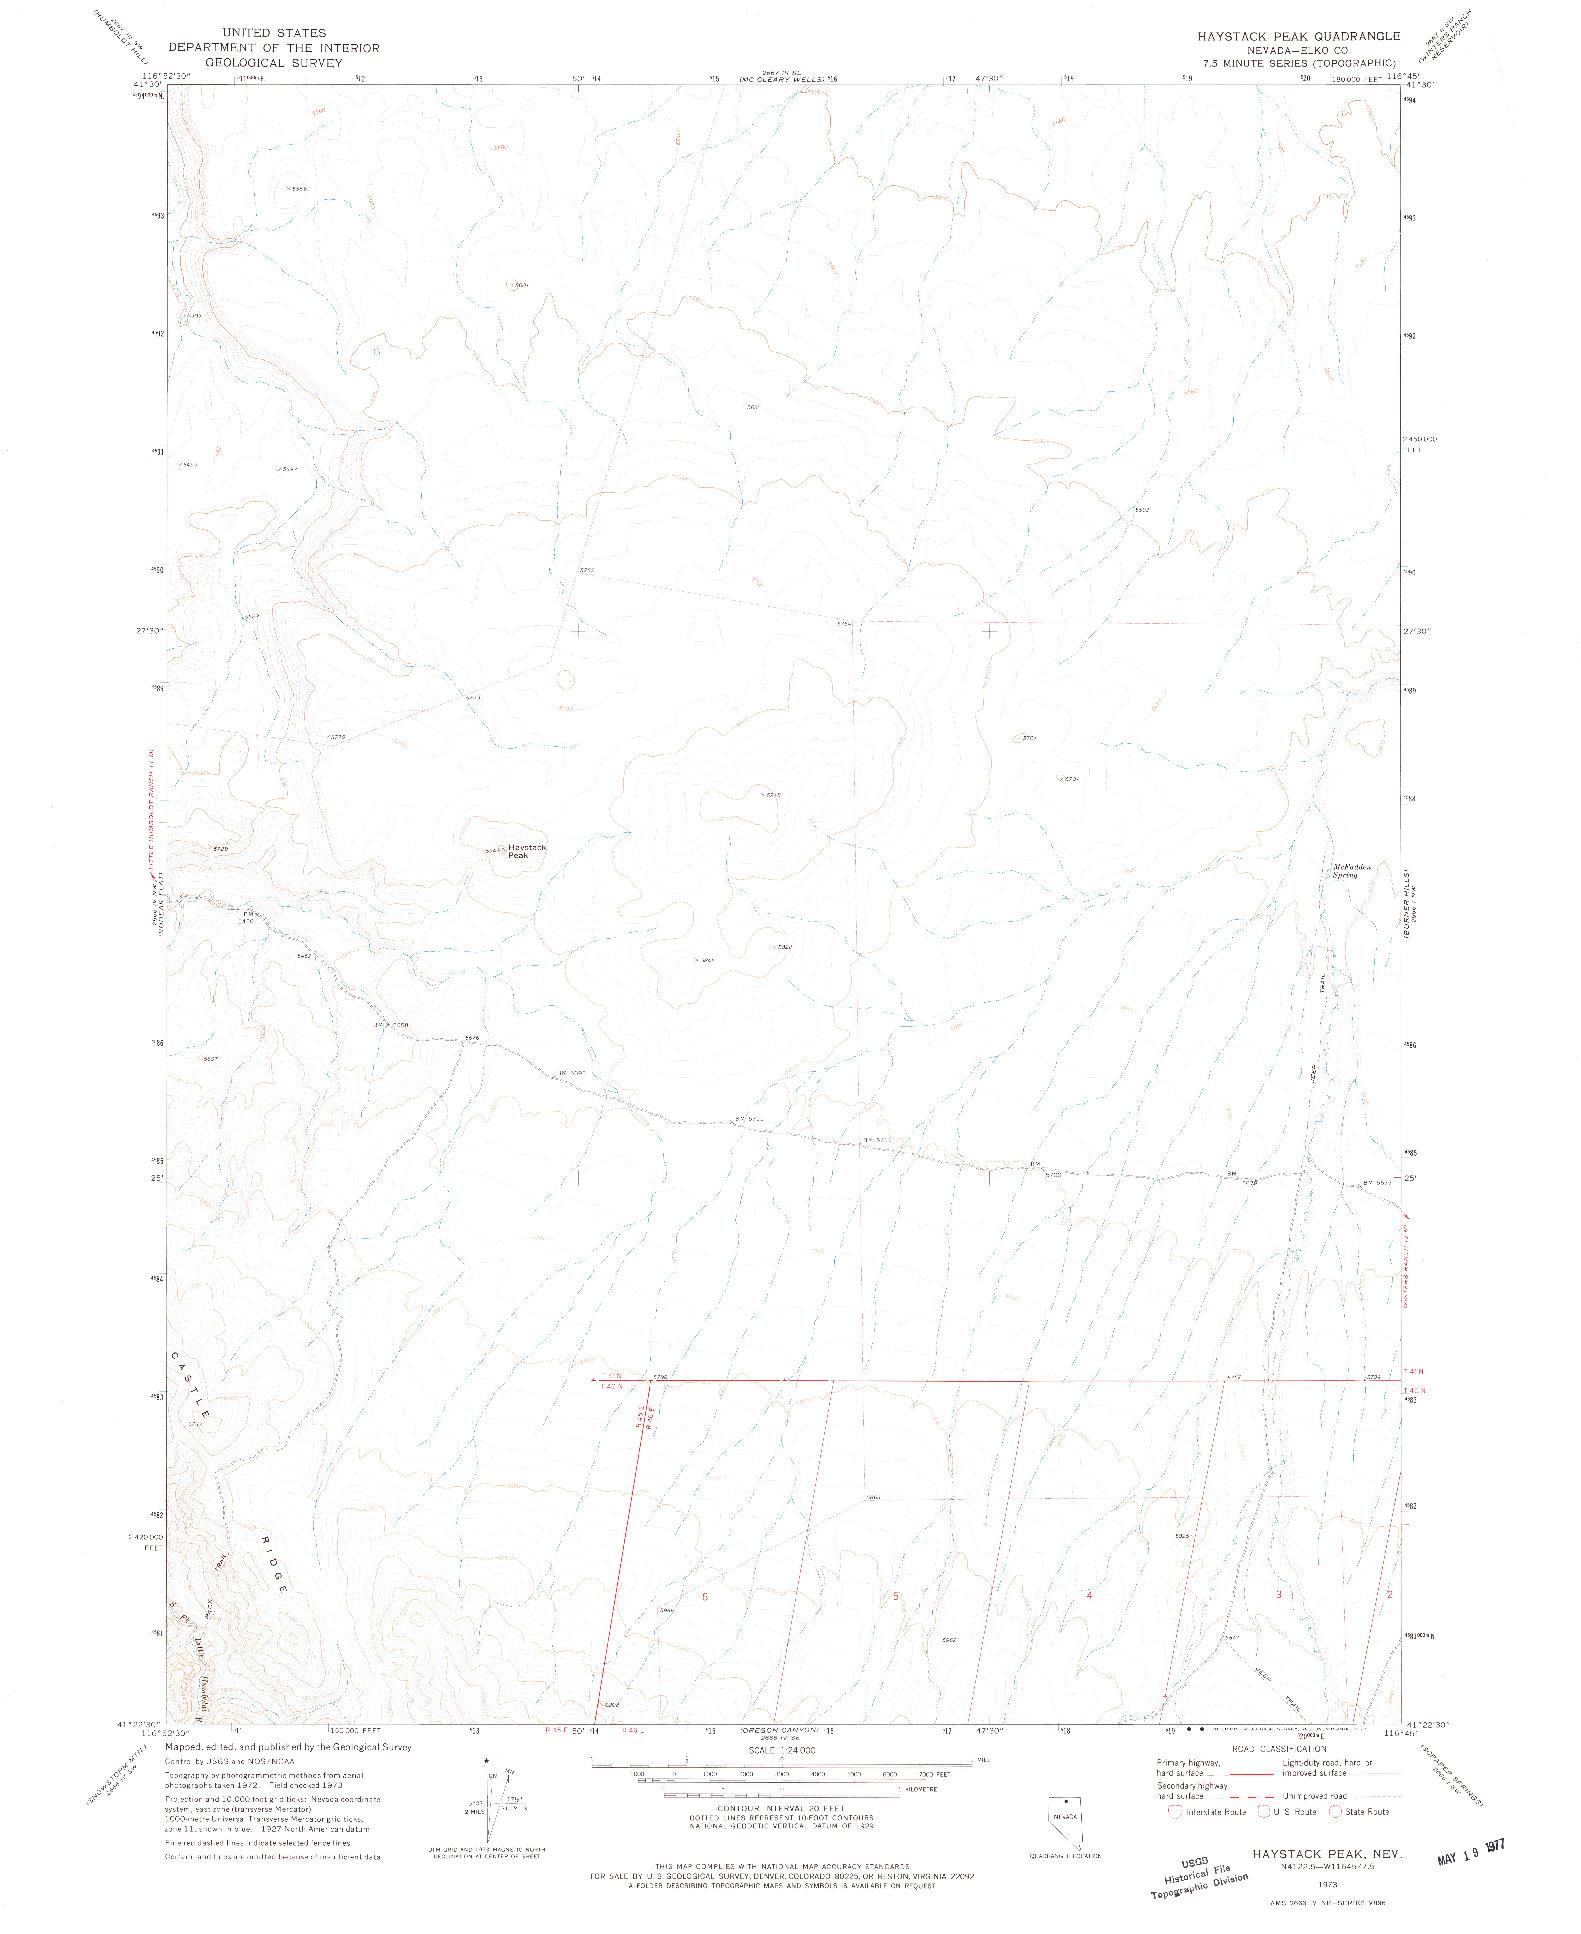 USGS 1:24000-SCALE QUADRANGLE FOR HAYSTACK PEAK, NV 1973